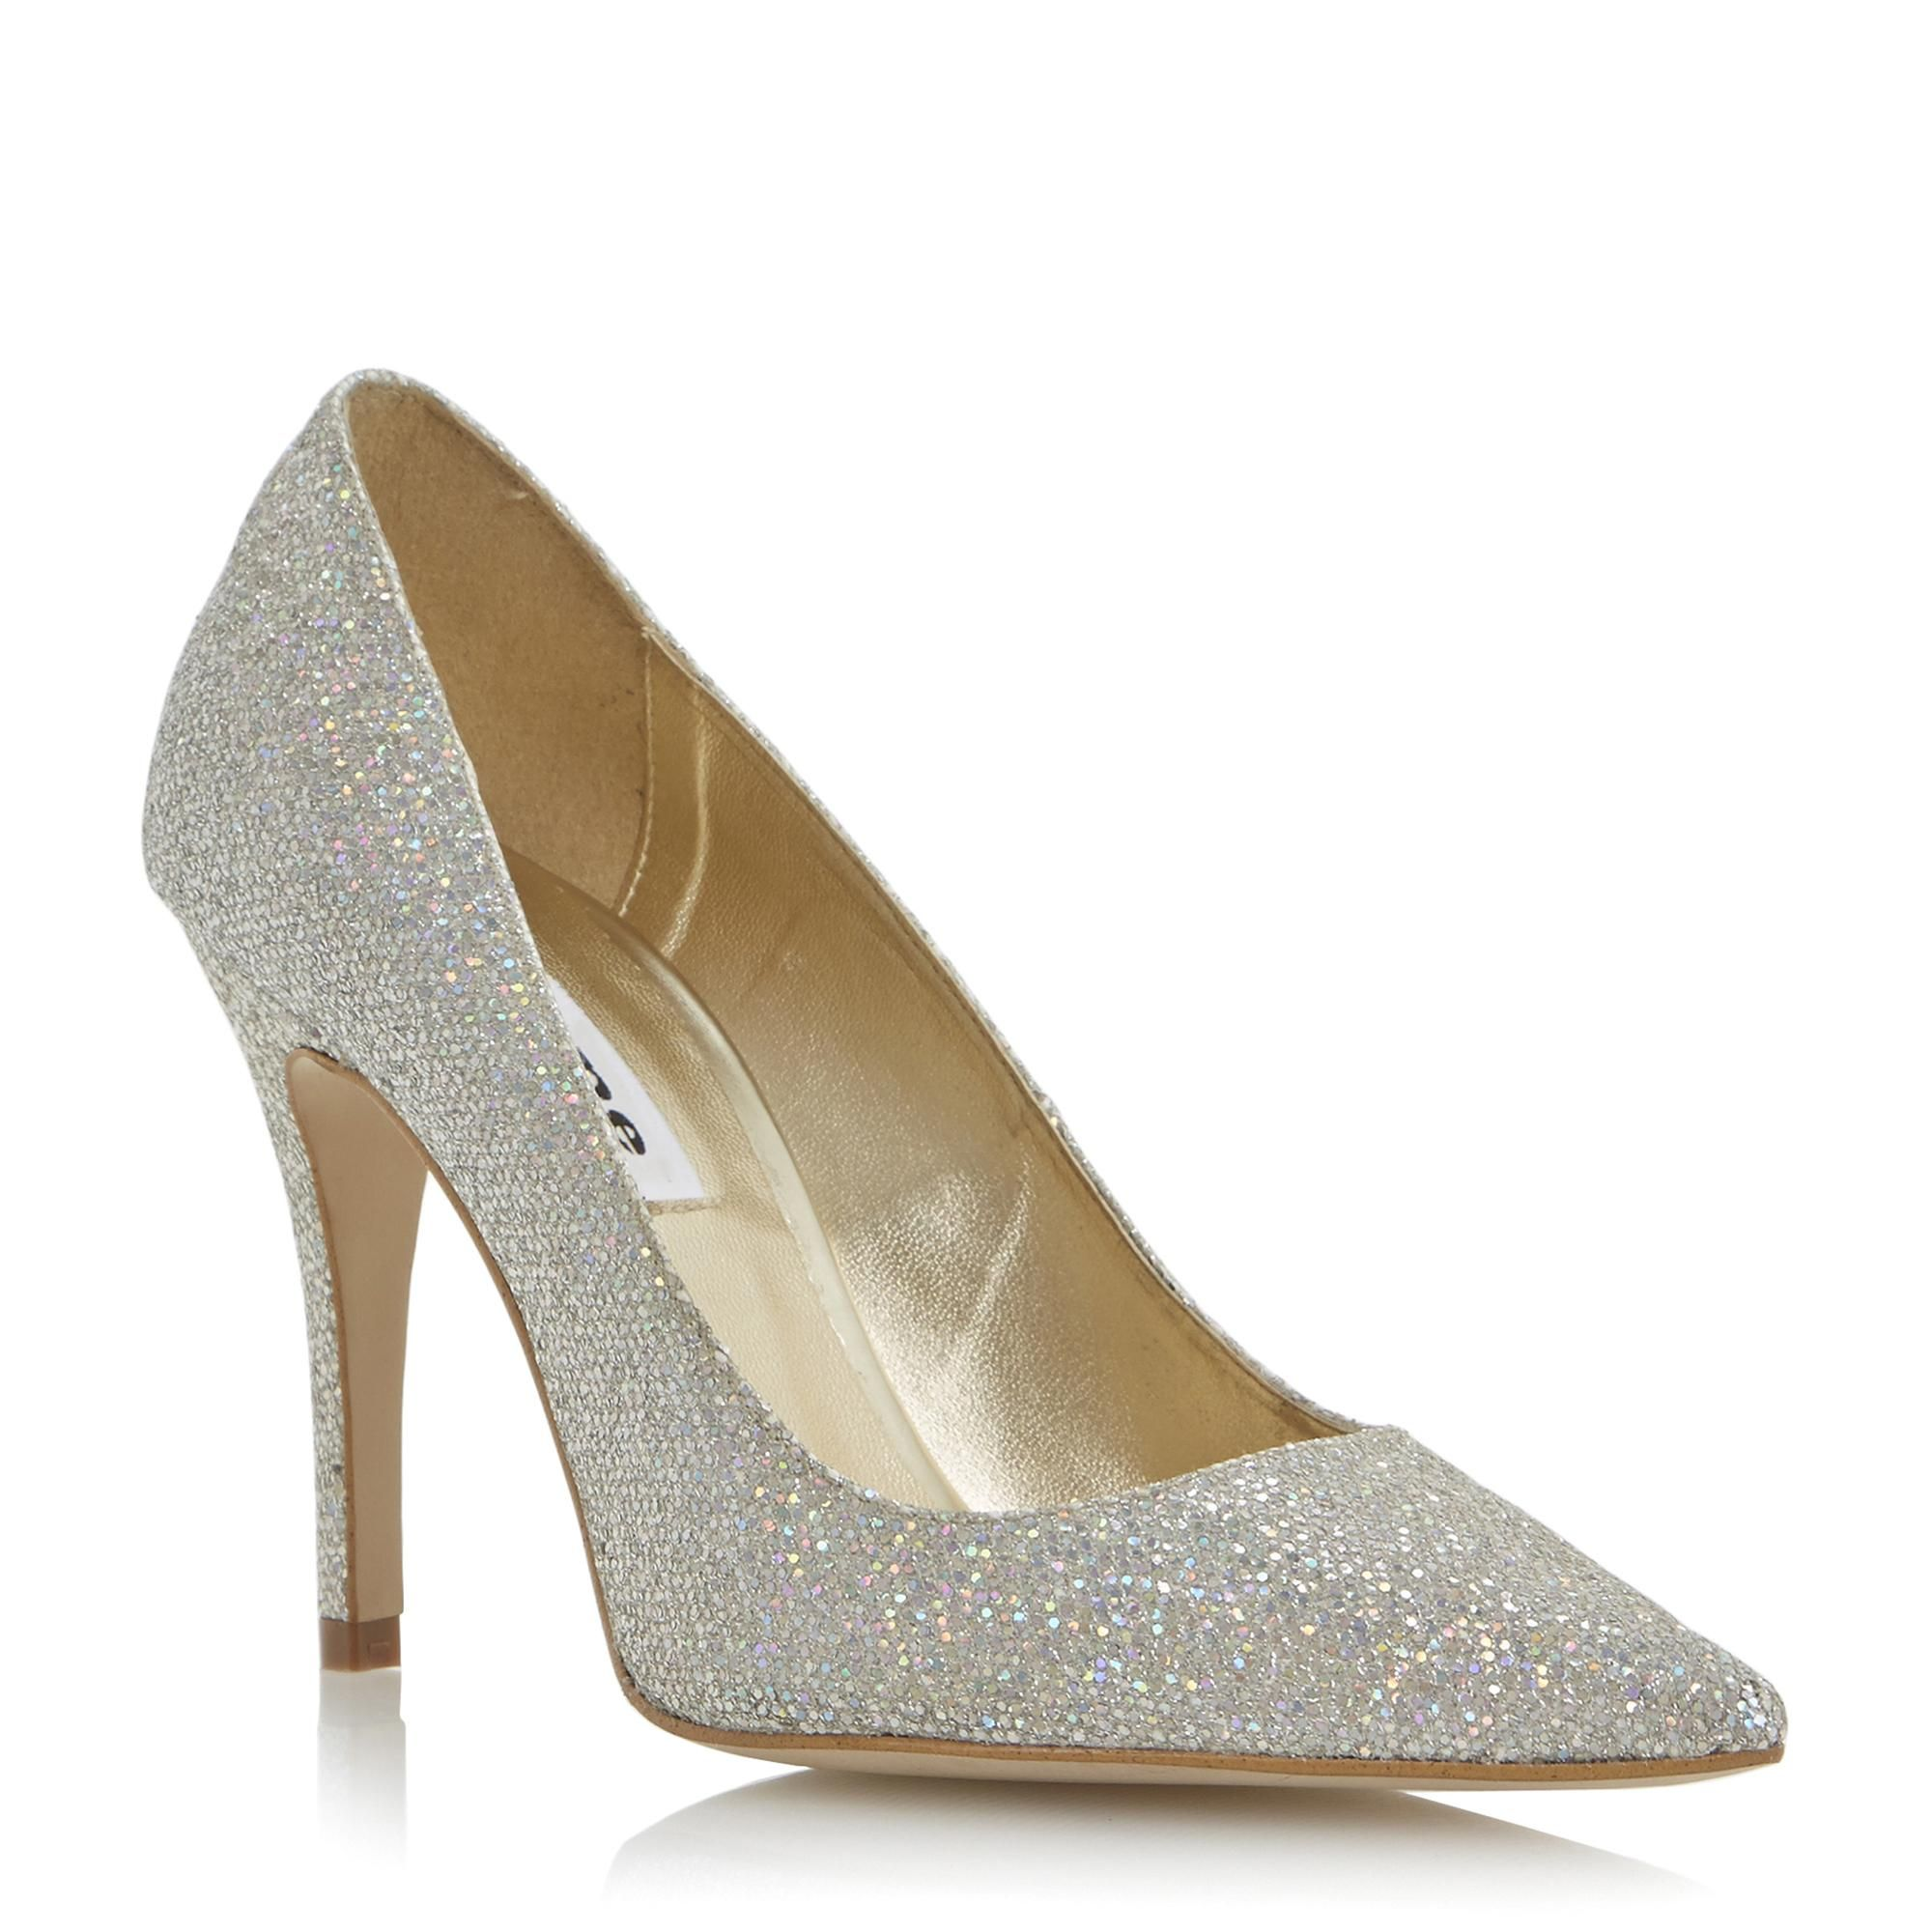 cceb83aae9b8d3 DUNE LADIES BRANDI - Glitter Lurex High Heel Pointed Toe Court Shoe - gold